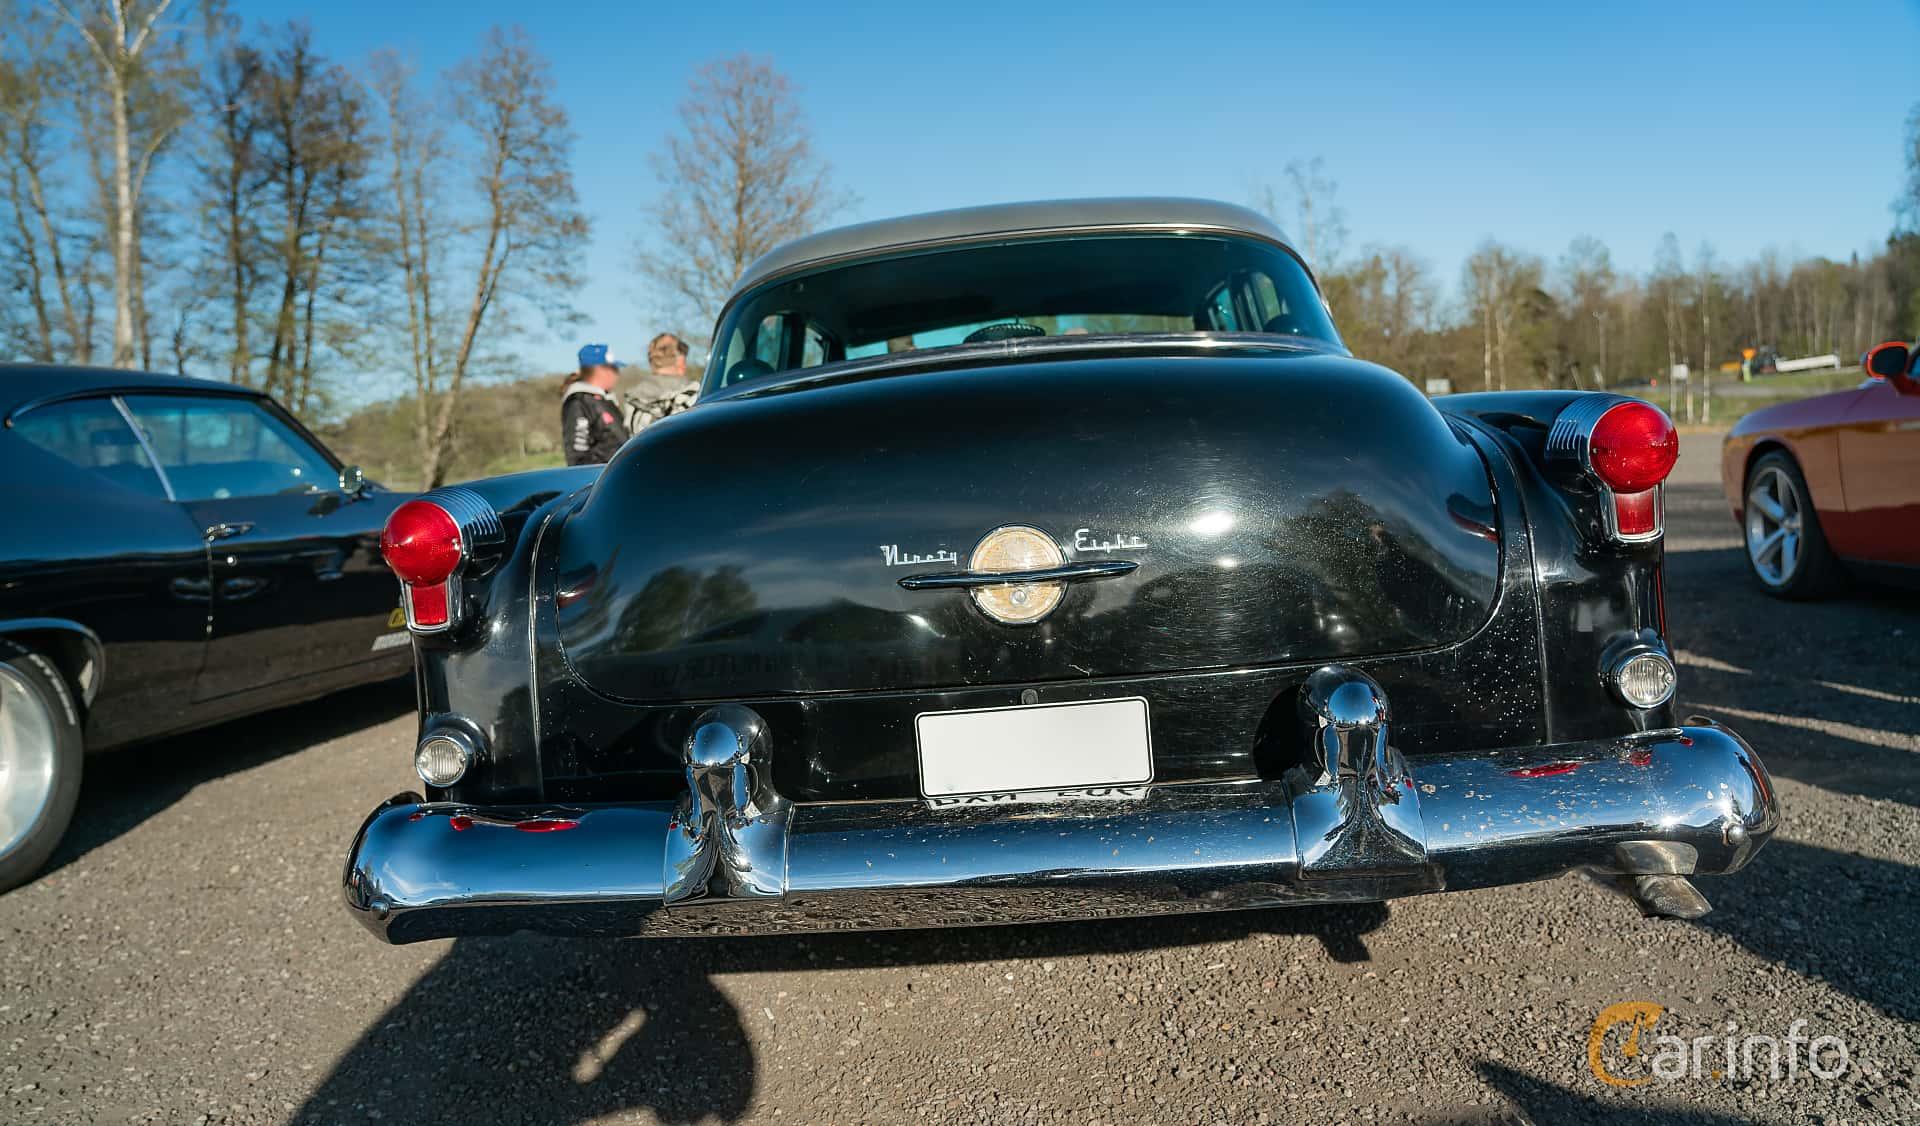 Oldsmobile Ninety-Eight Sedan 5.0 V8 Hydra-Matic, 167hp, 1953 at Lissma Classic Car 2019 vecka 20